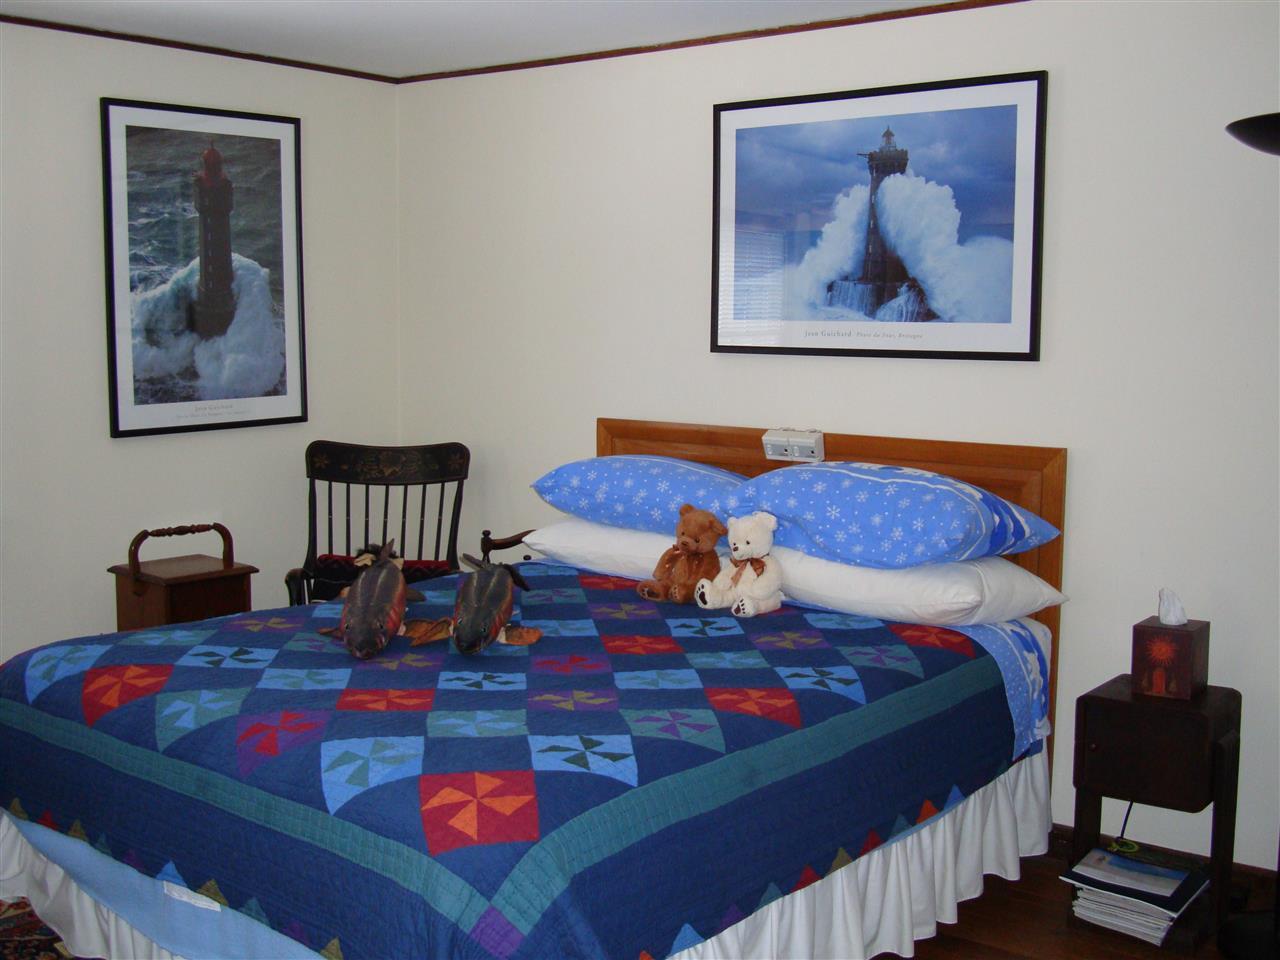 Mount-Snow-Real-Estate-4385548-24